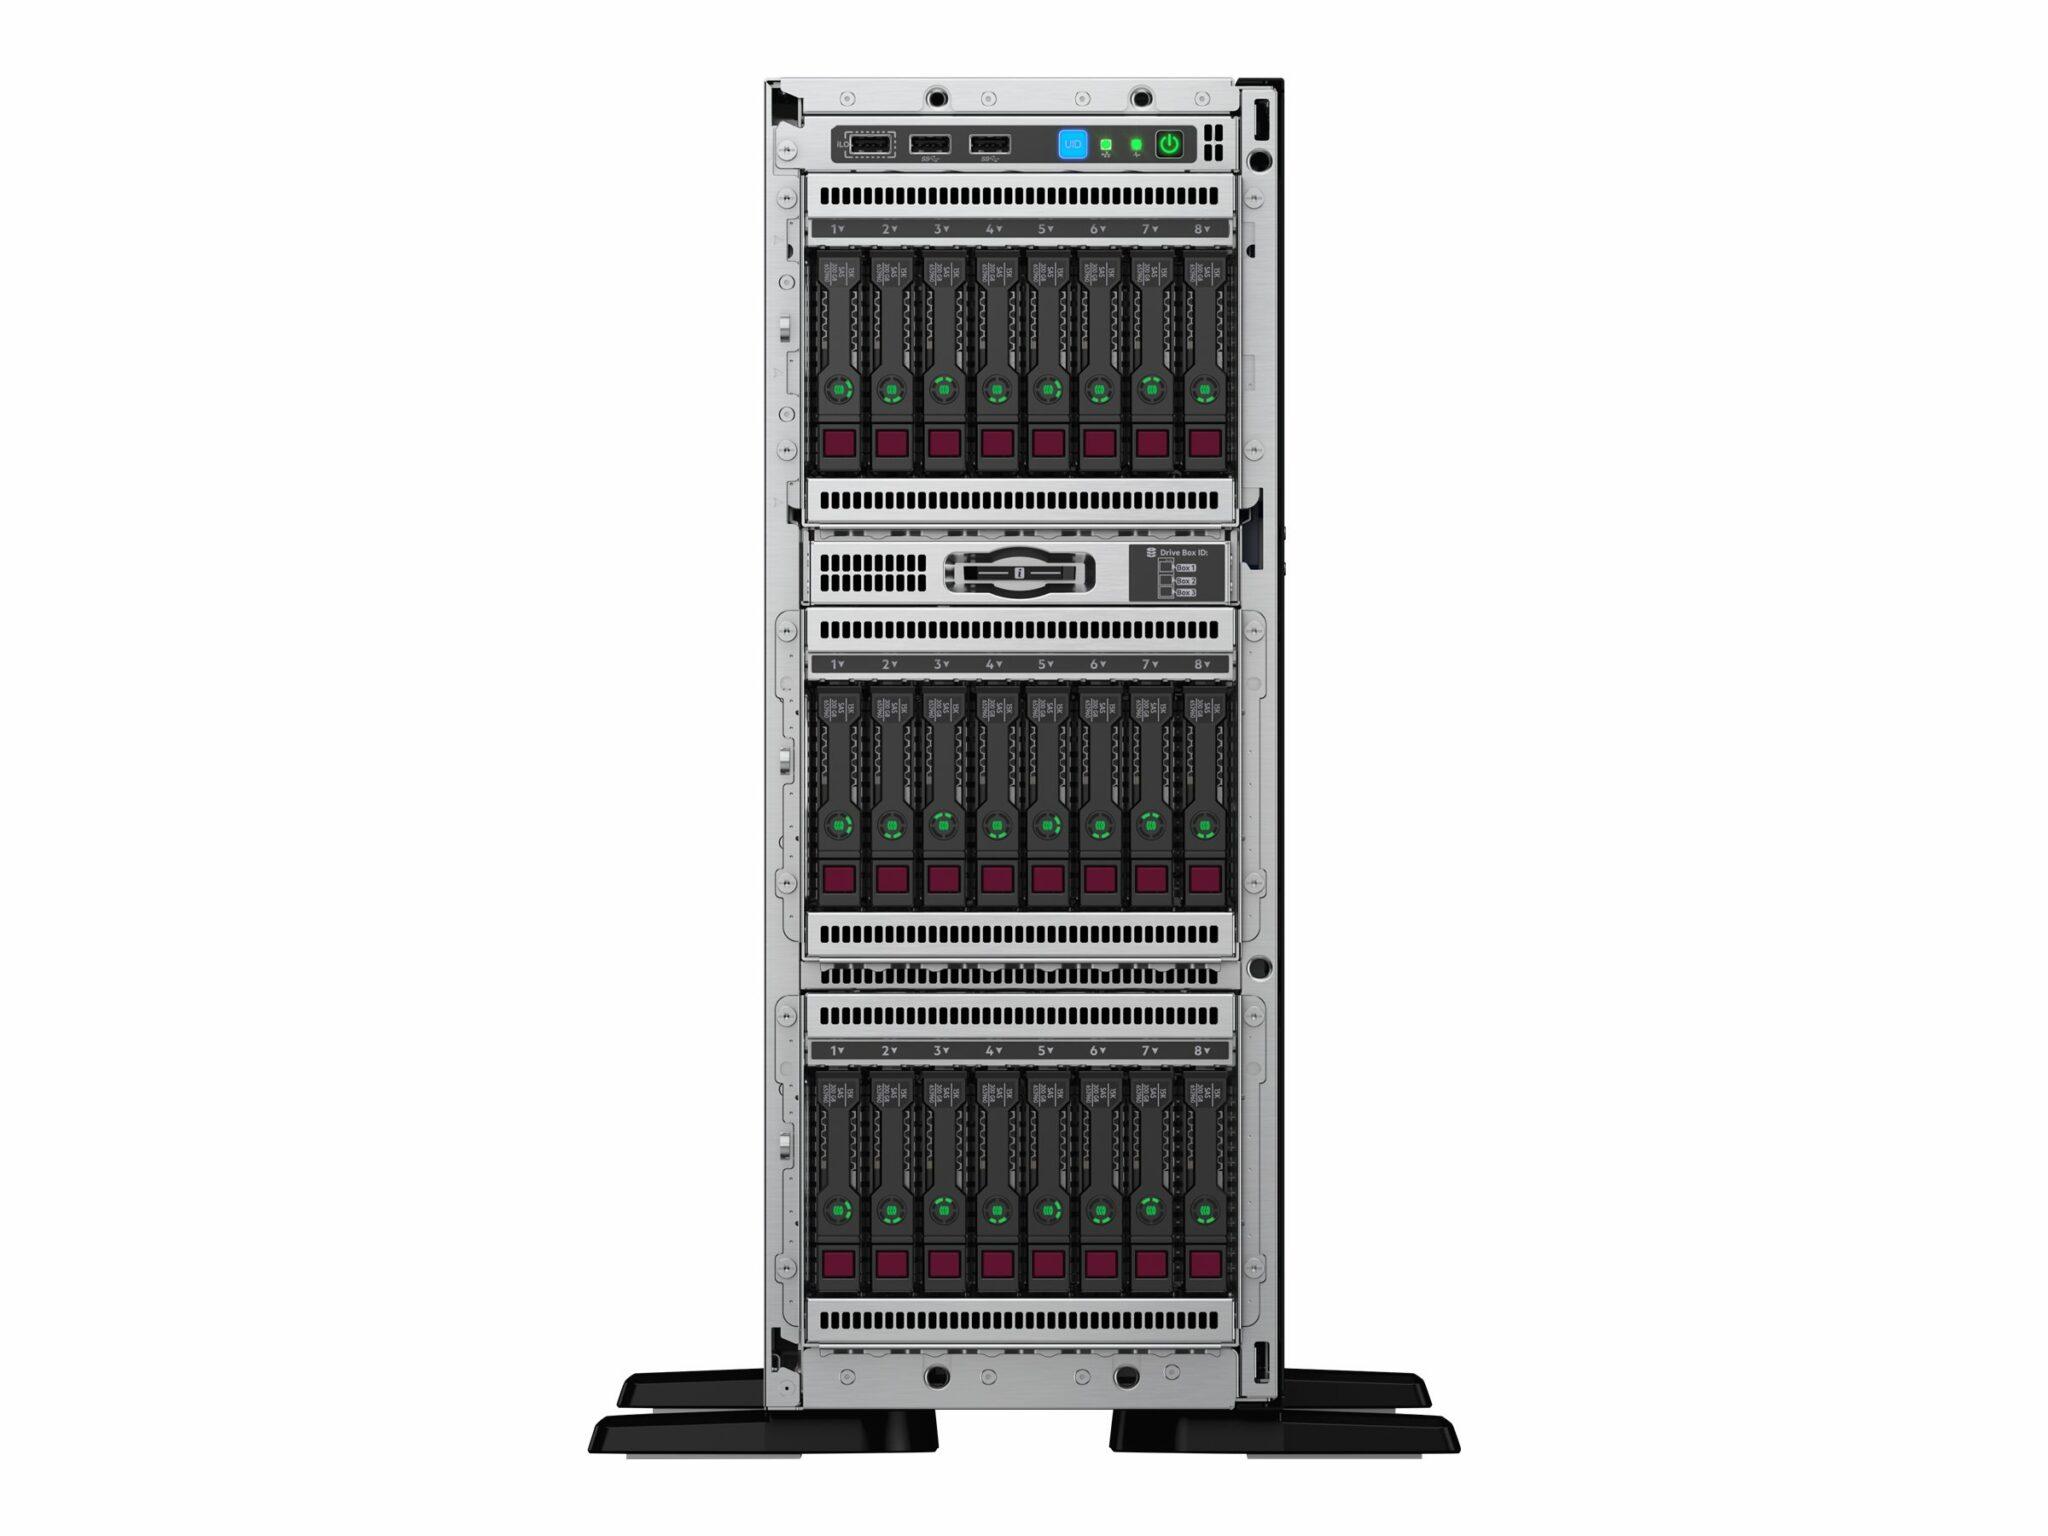 Hpe-proliant-ml350-gen10-performance-server-tower-4u-2-way-2-x-xeon-gold-5118-2-3-ghz-ram-32-gb